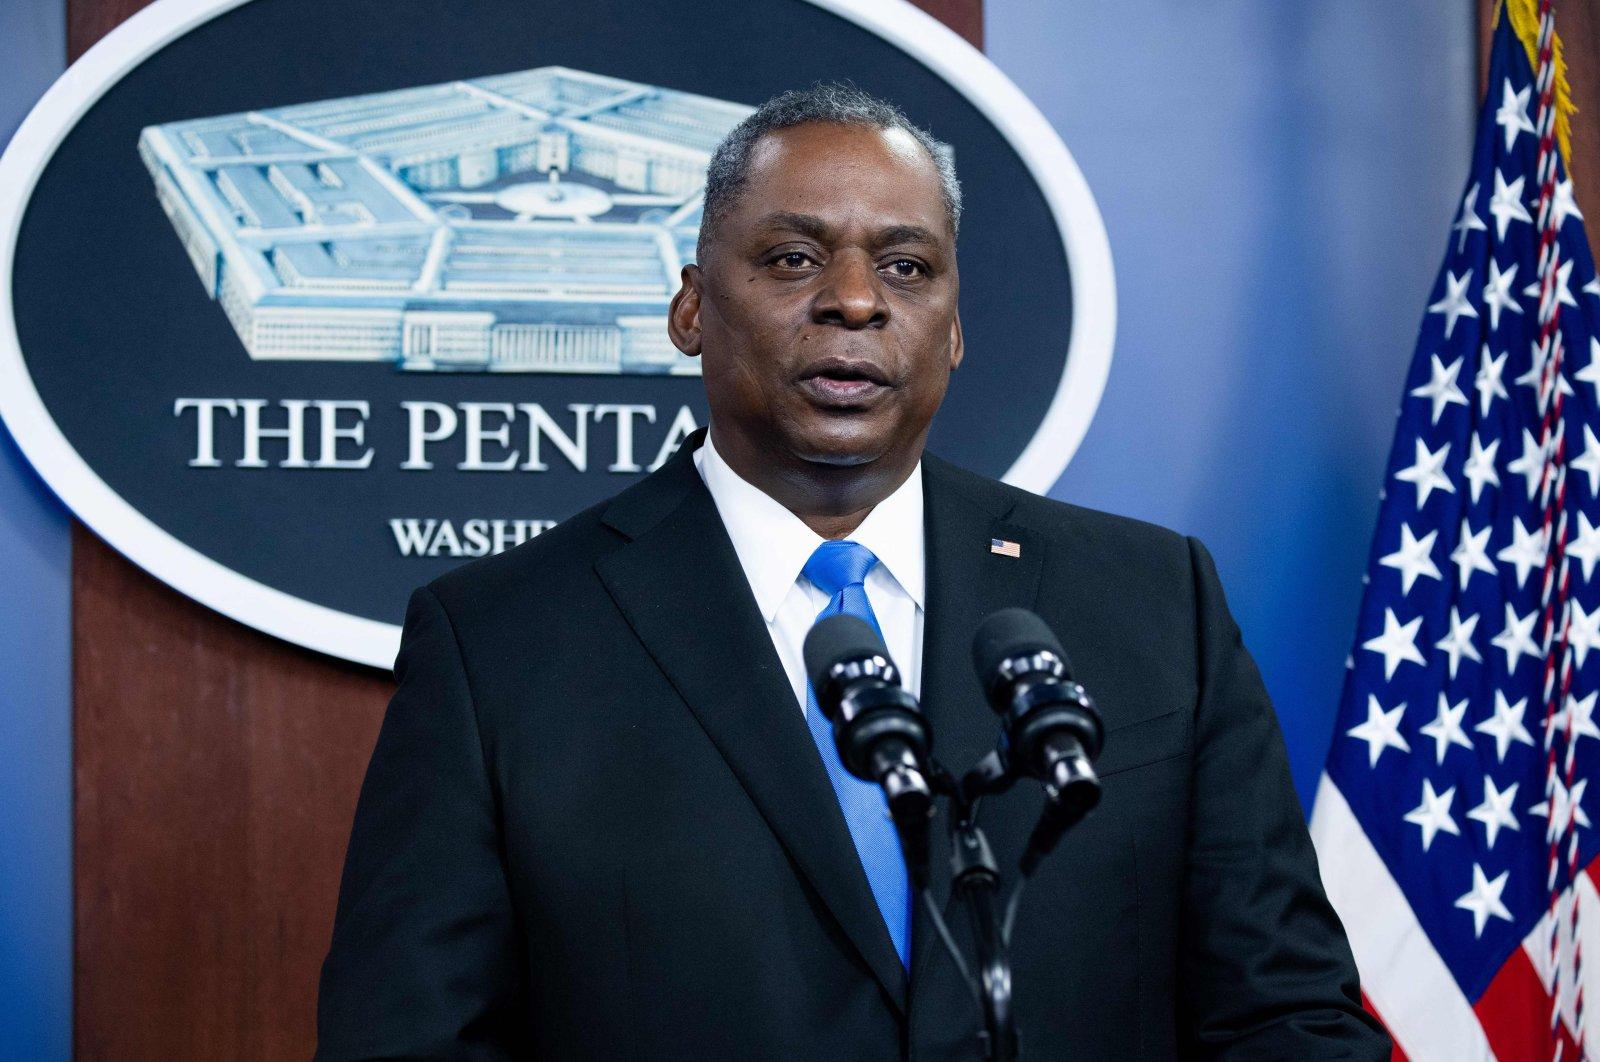 U.S. Secretary of Defense Lloyd Austin speaks during a visit by U.S. President Joe Biden to the Pentagon in Washington, D.C., Feb. 10, 2021. (AFP Photo)